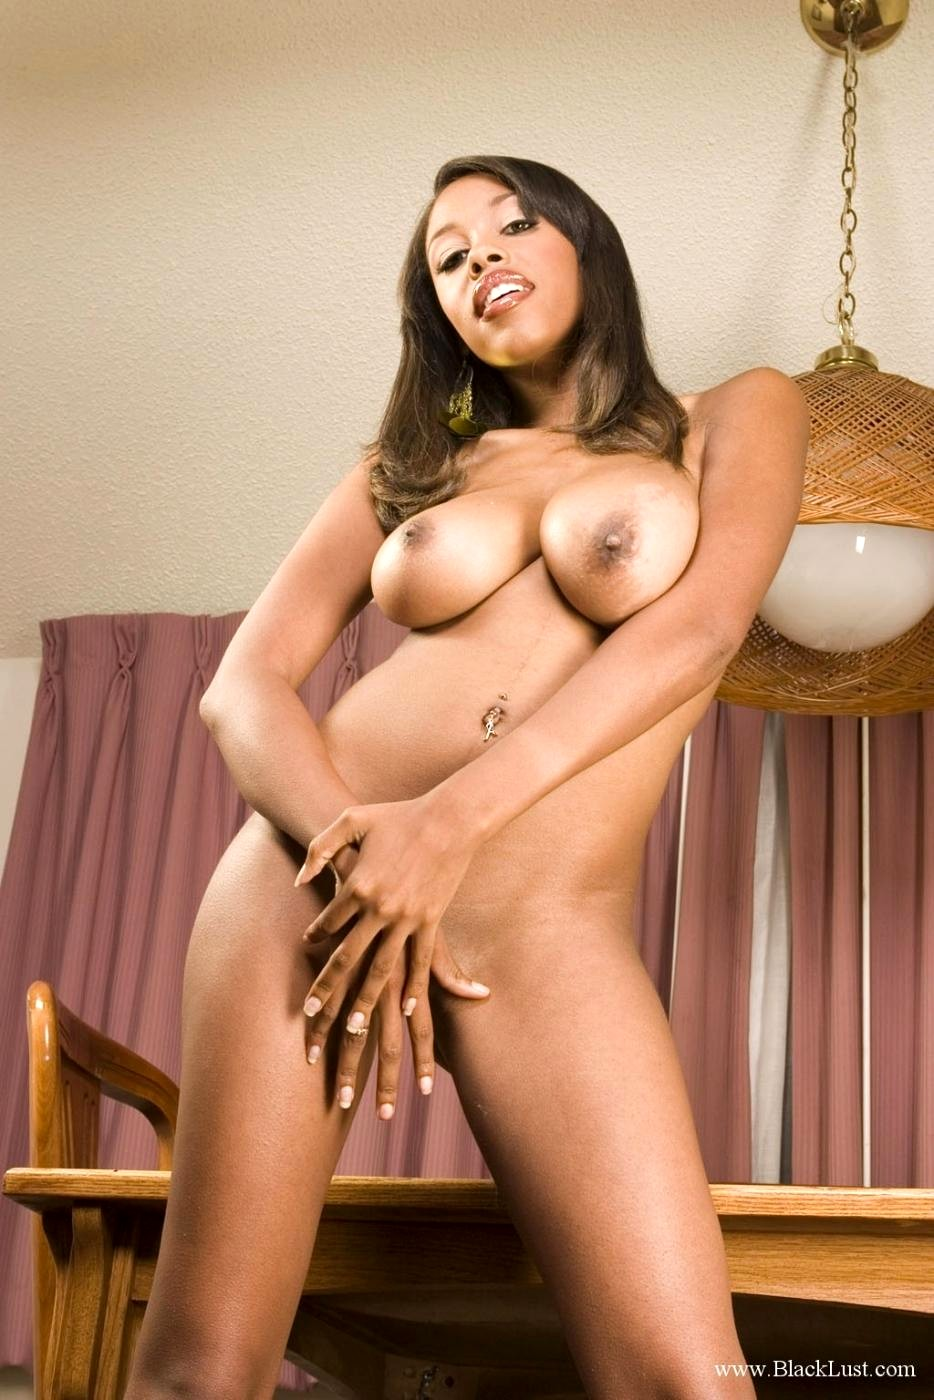 sexy nude girl ass gifs